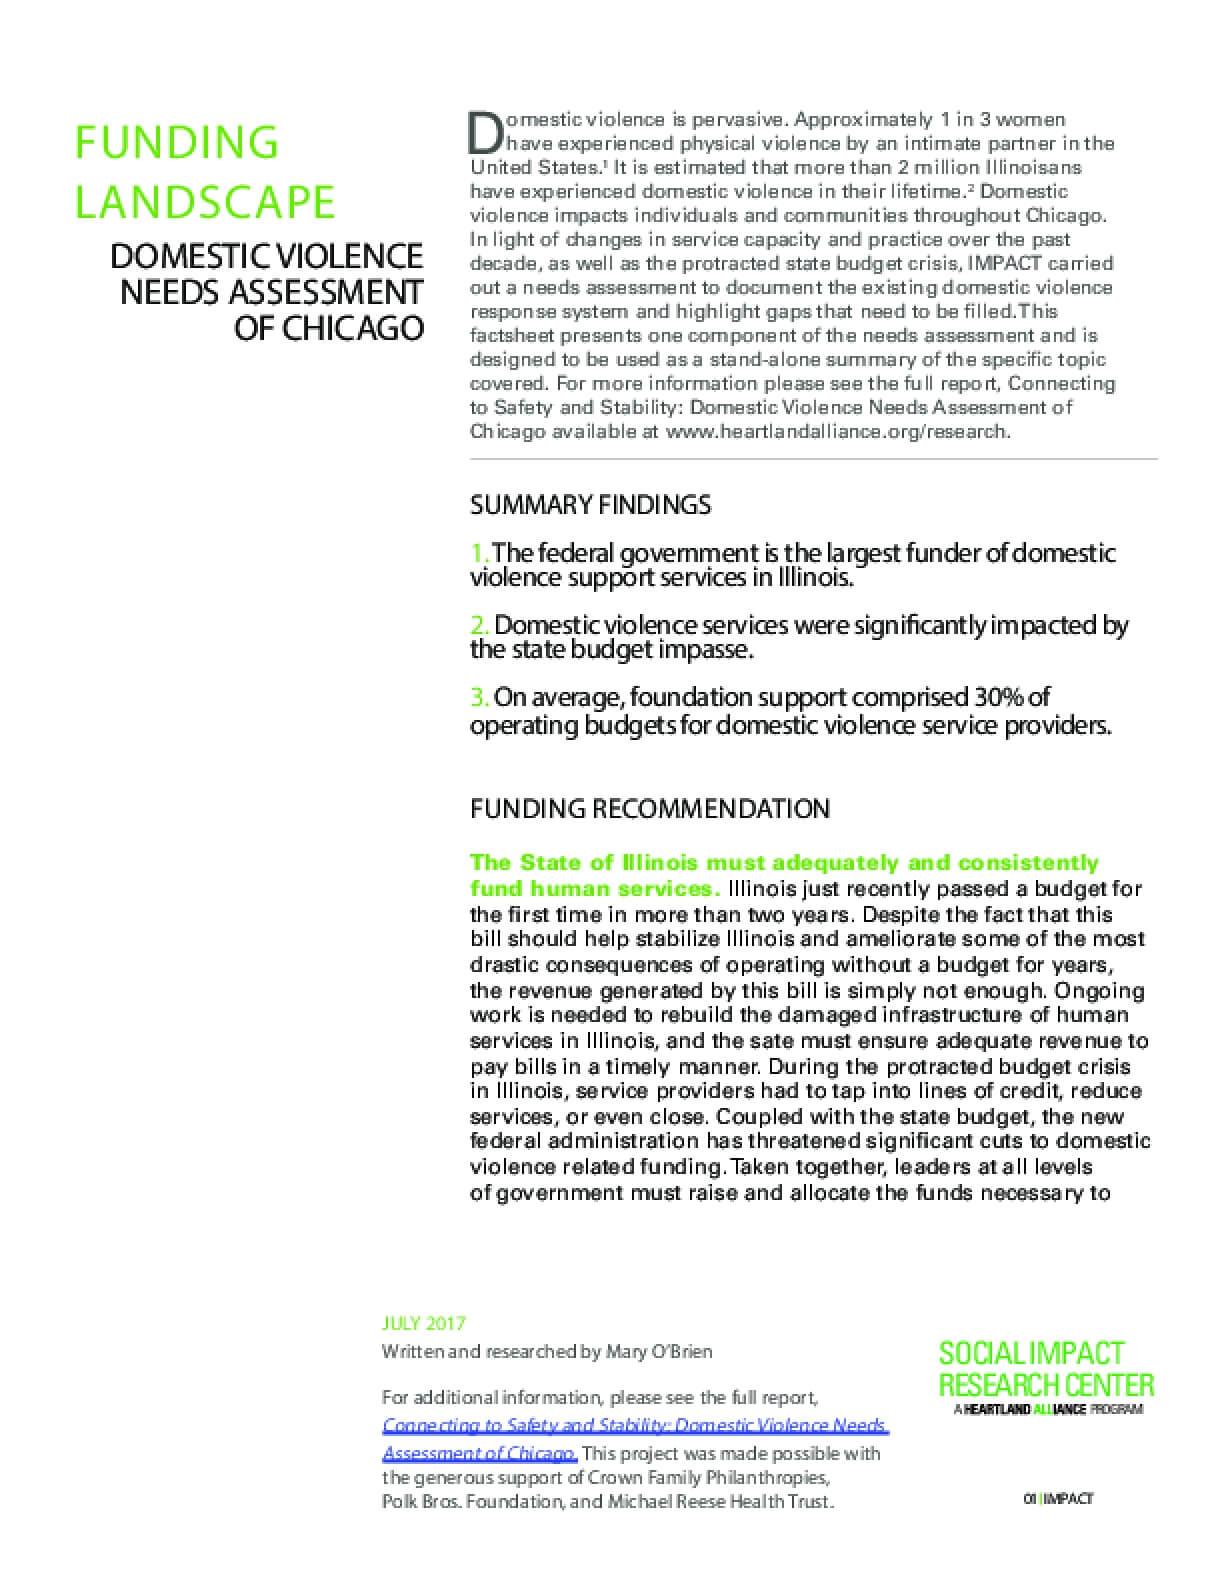 Factsheet: Funding Landscape (DV Landscape)